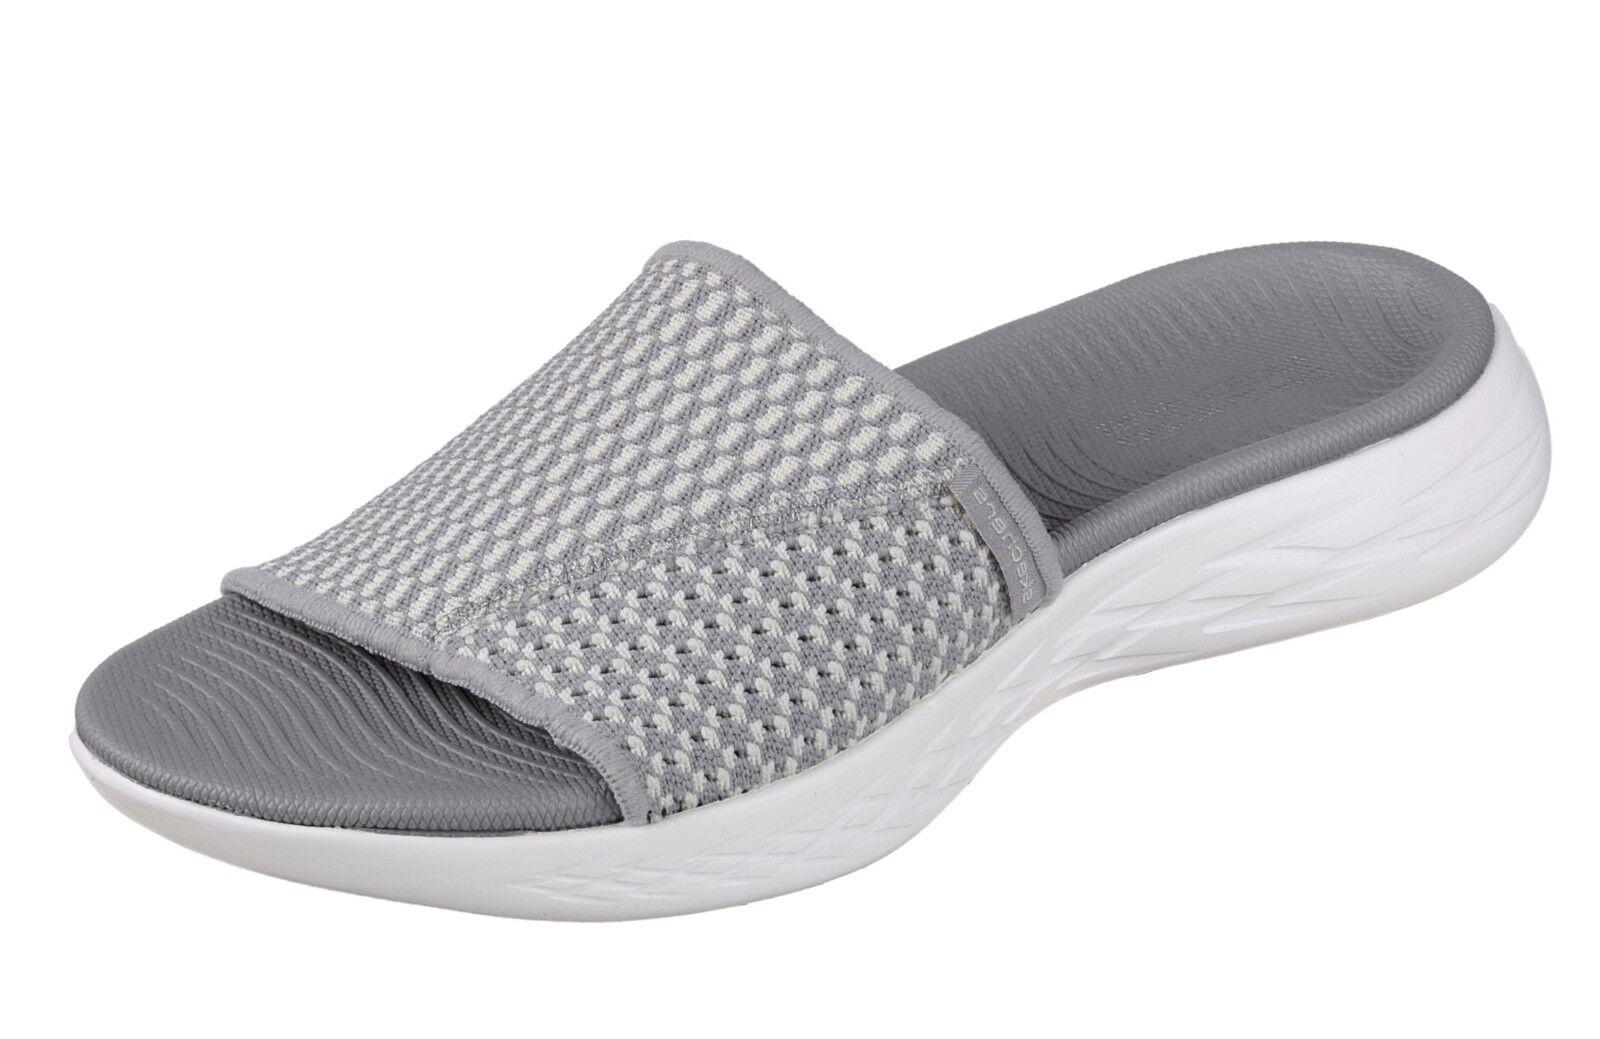 Skechers NEW On The Go 600  Nitto gris comfort slides sandals flip flops 3-8